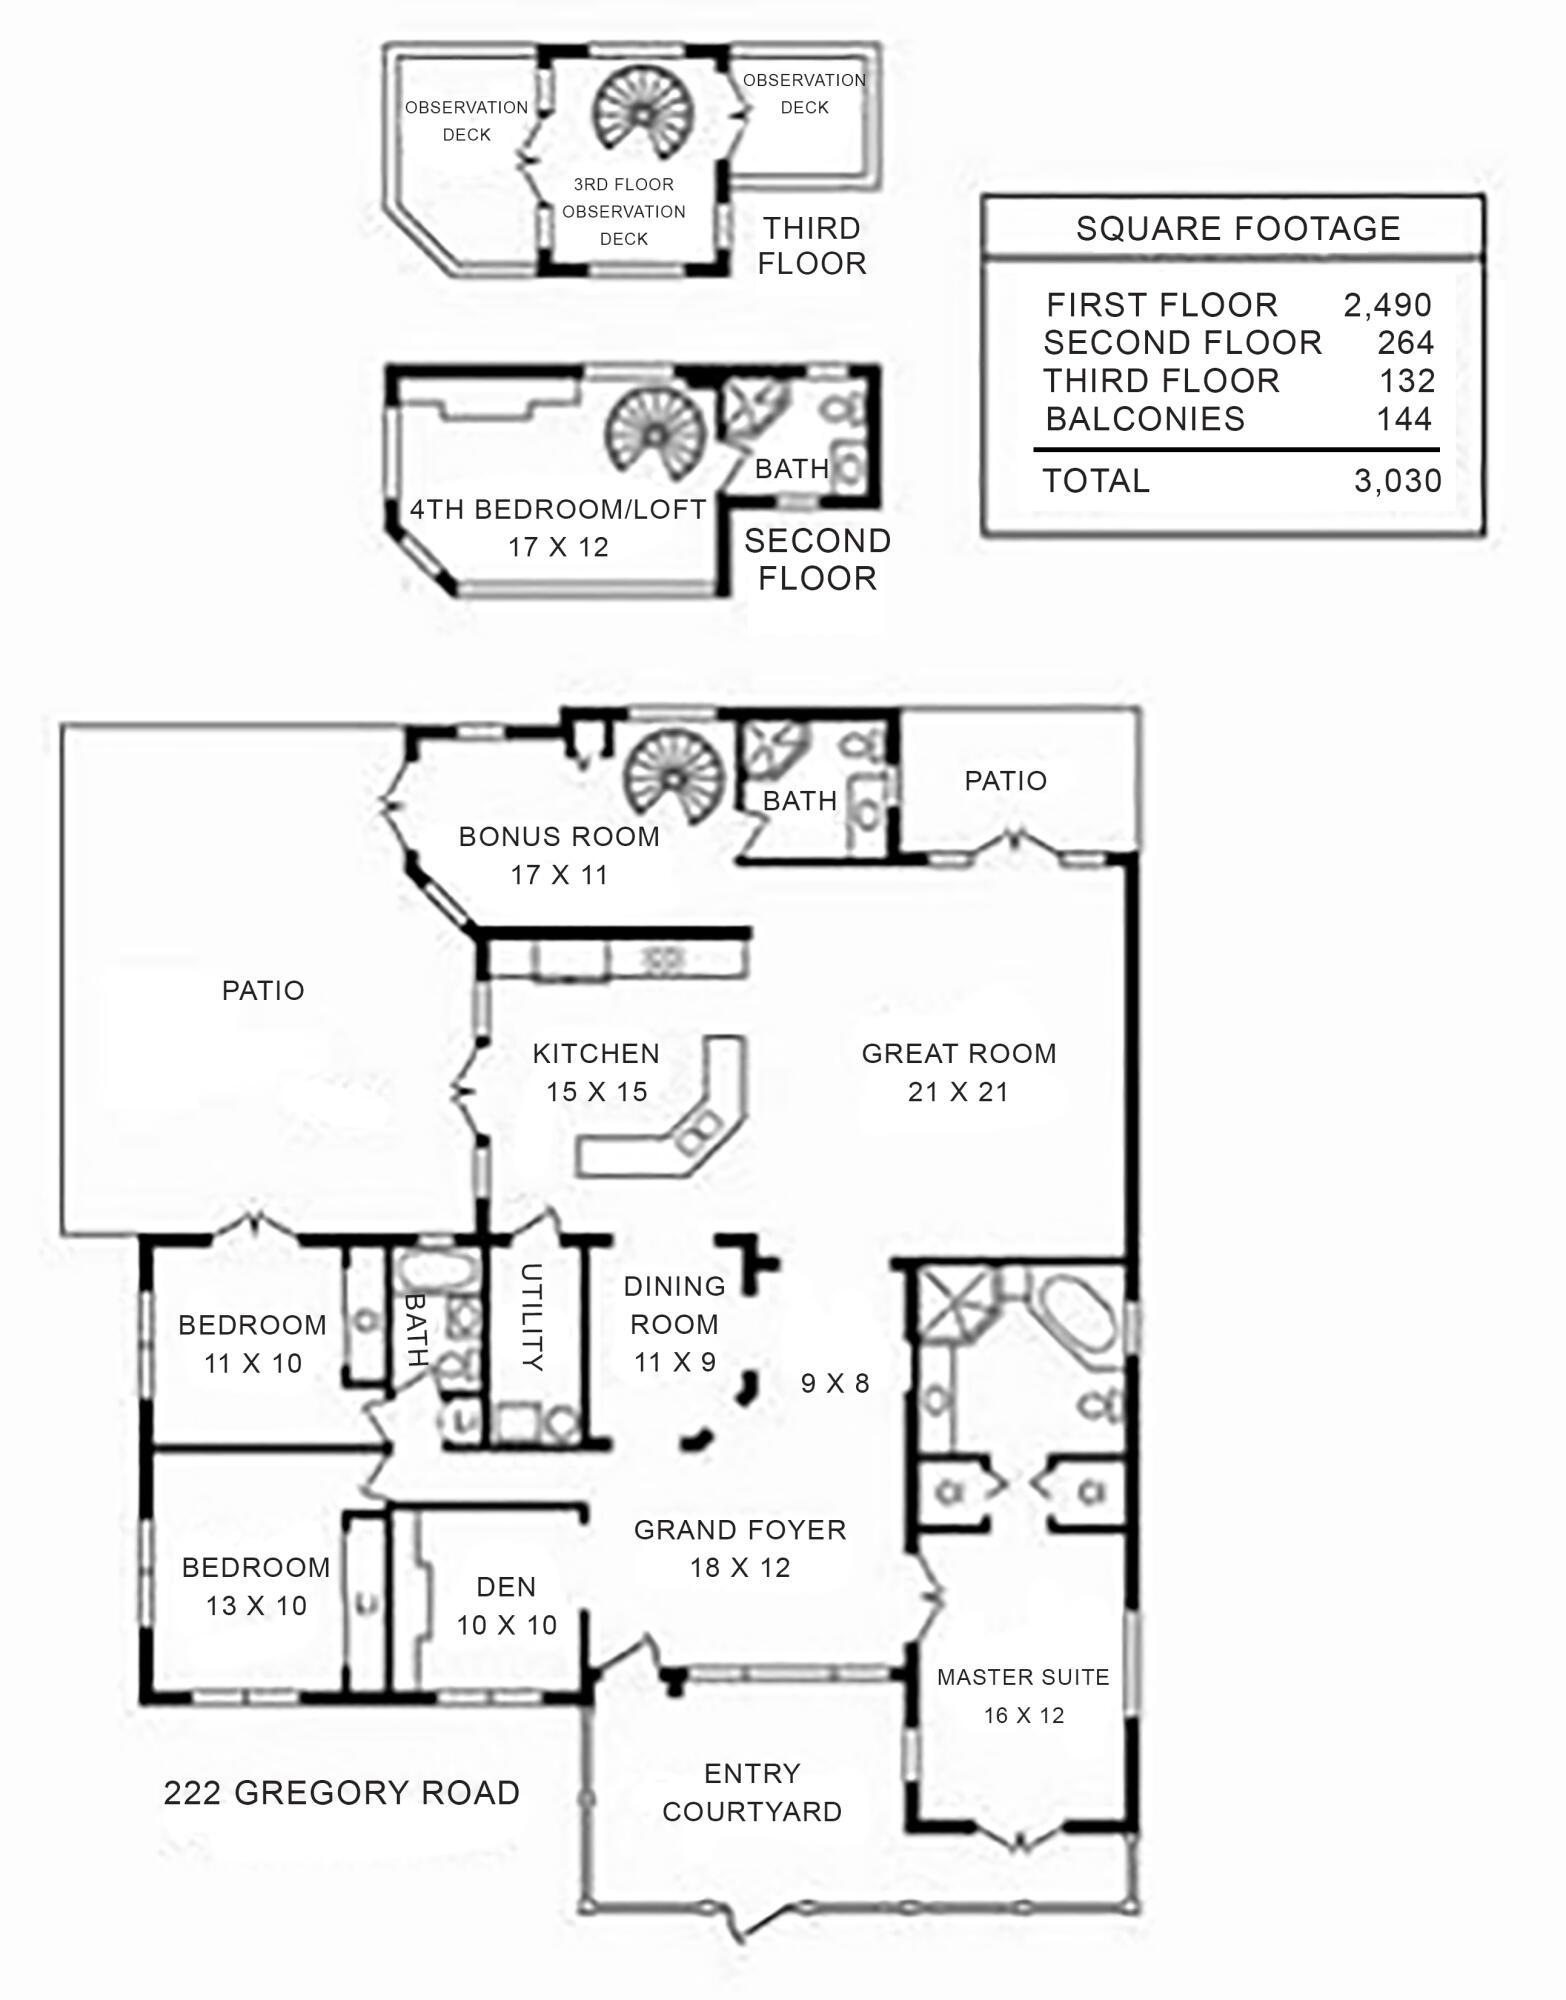 Floor Plan 222 Gregory Road copy